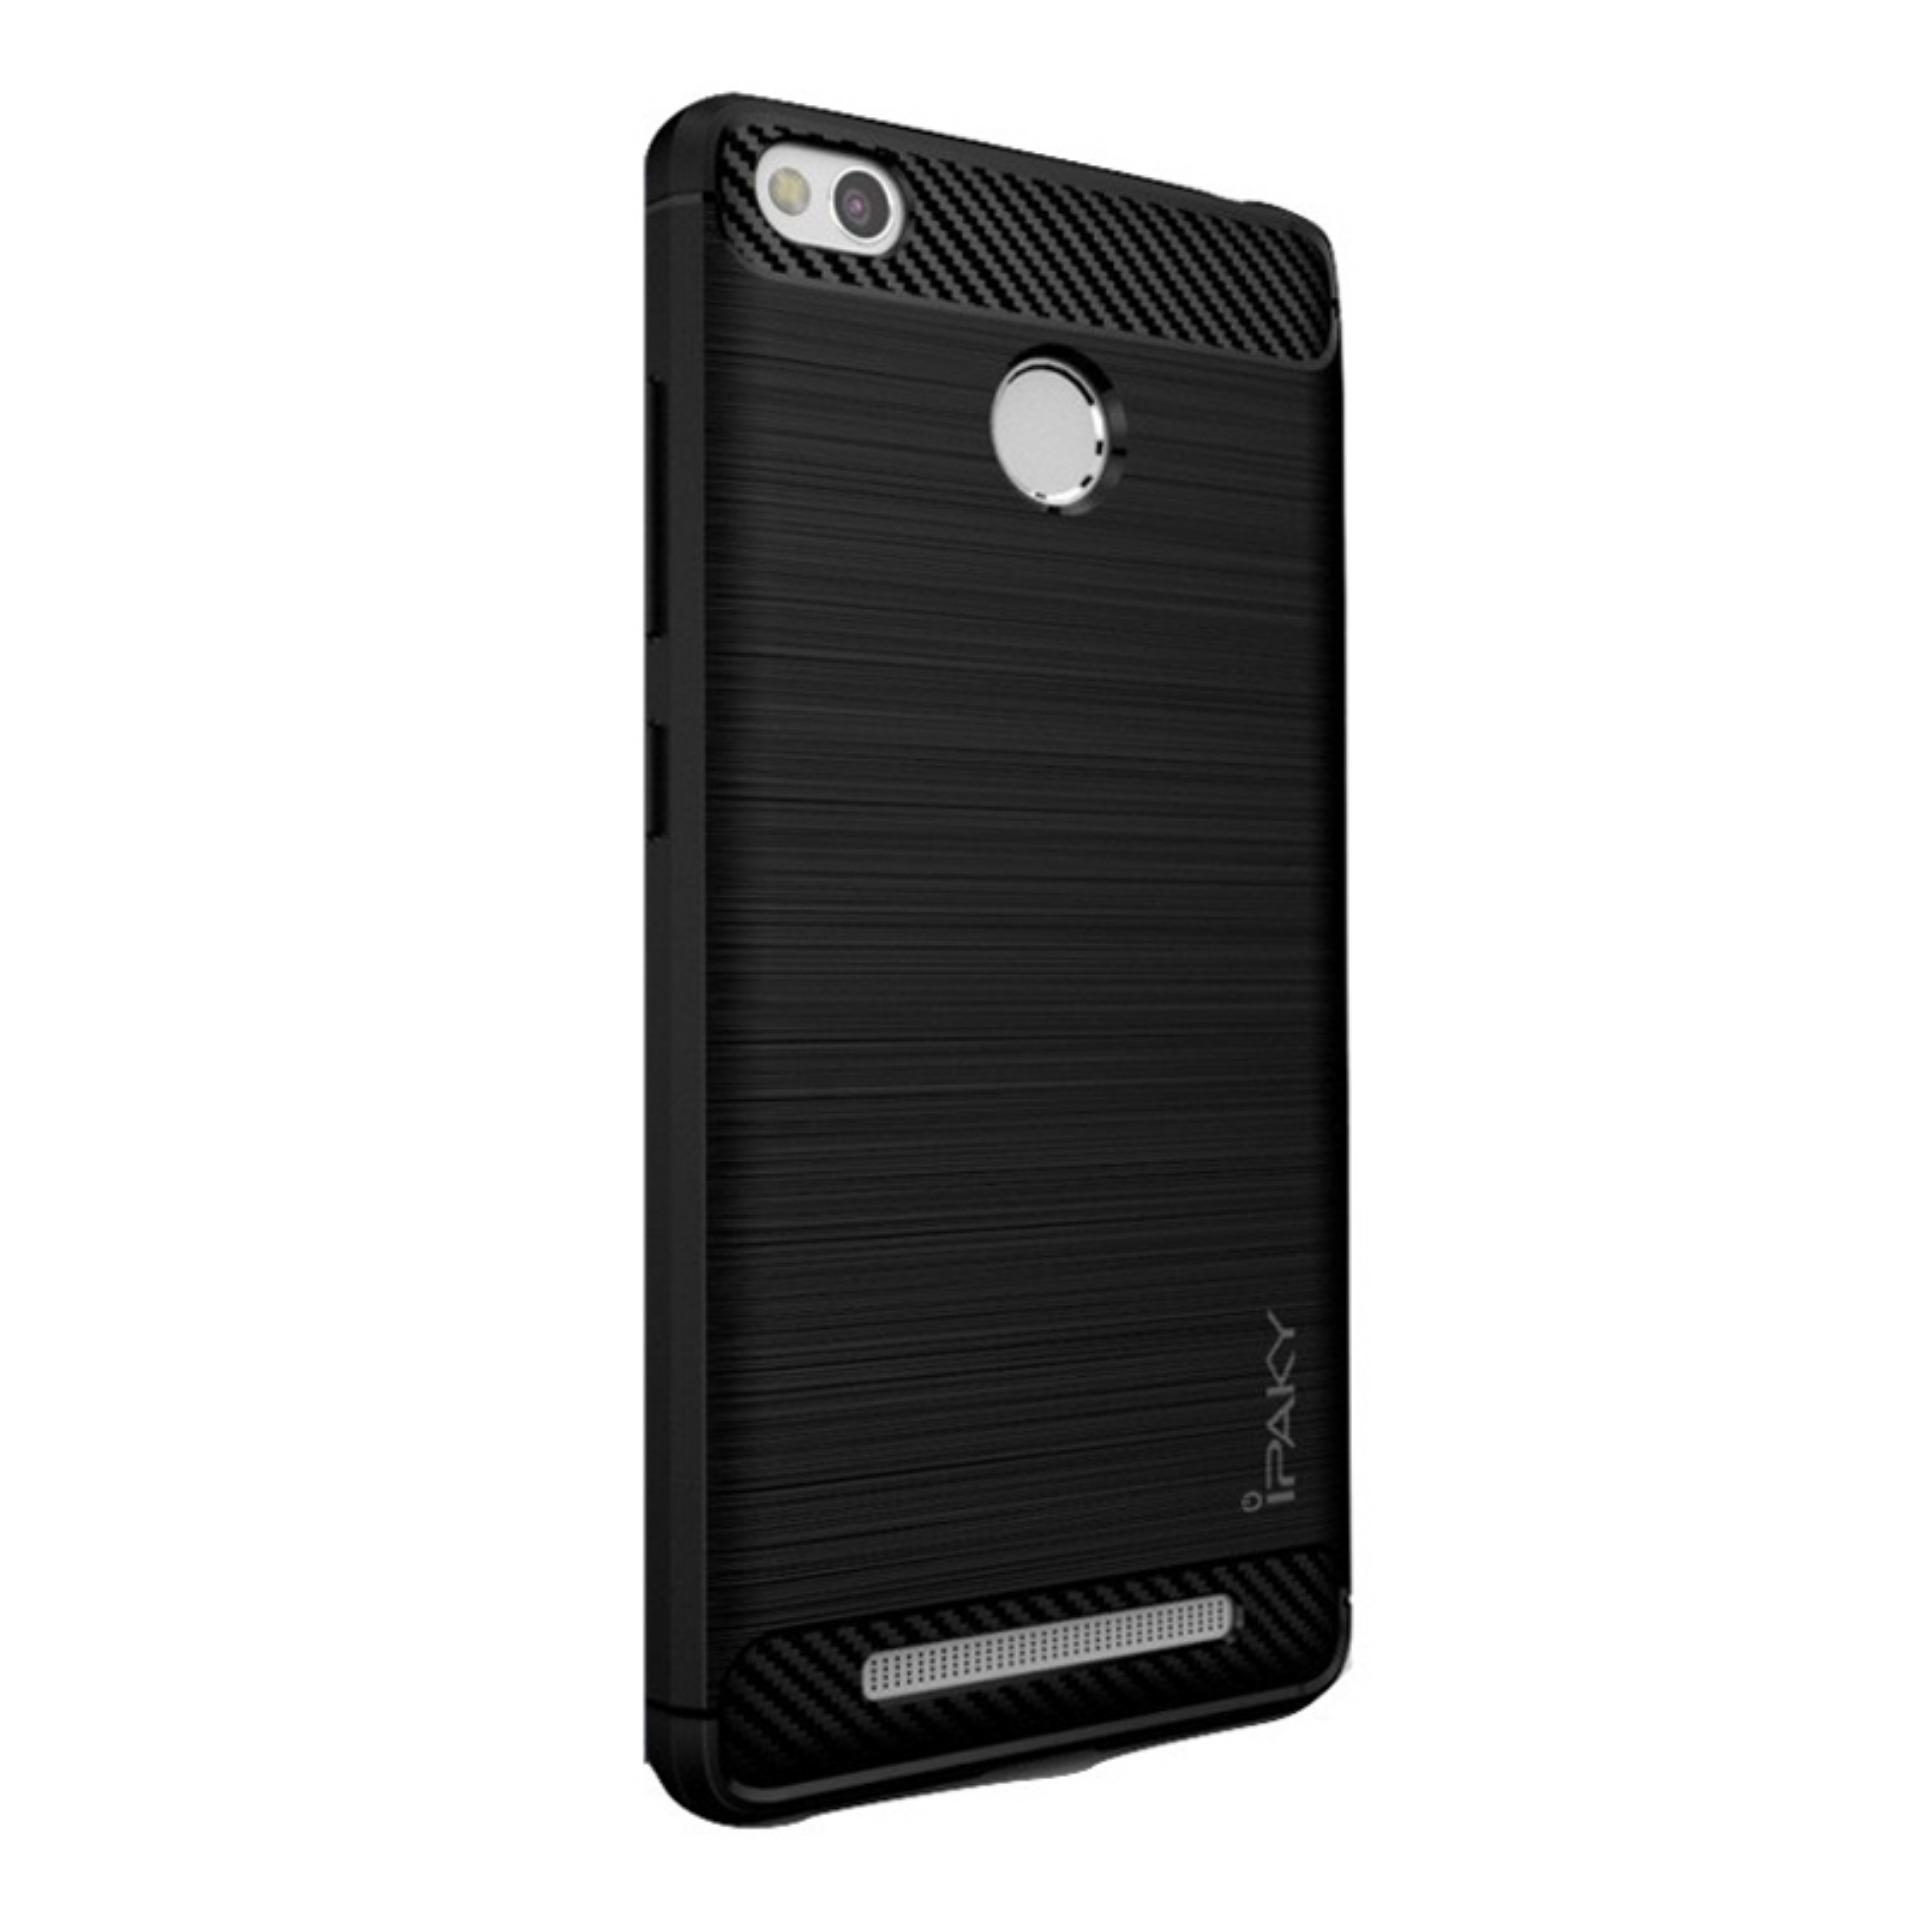 Original Lazada Case Ipaky Shockproof Carbon Hybrid For Xiaomi Redmi 4x - Hitam